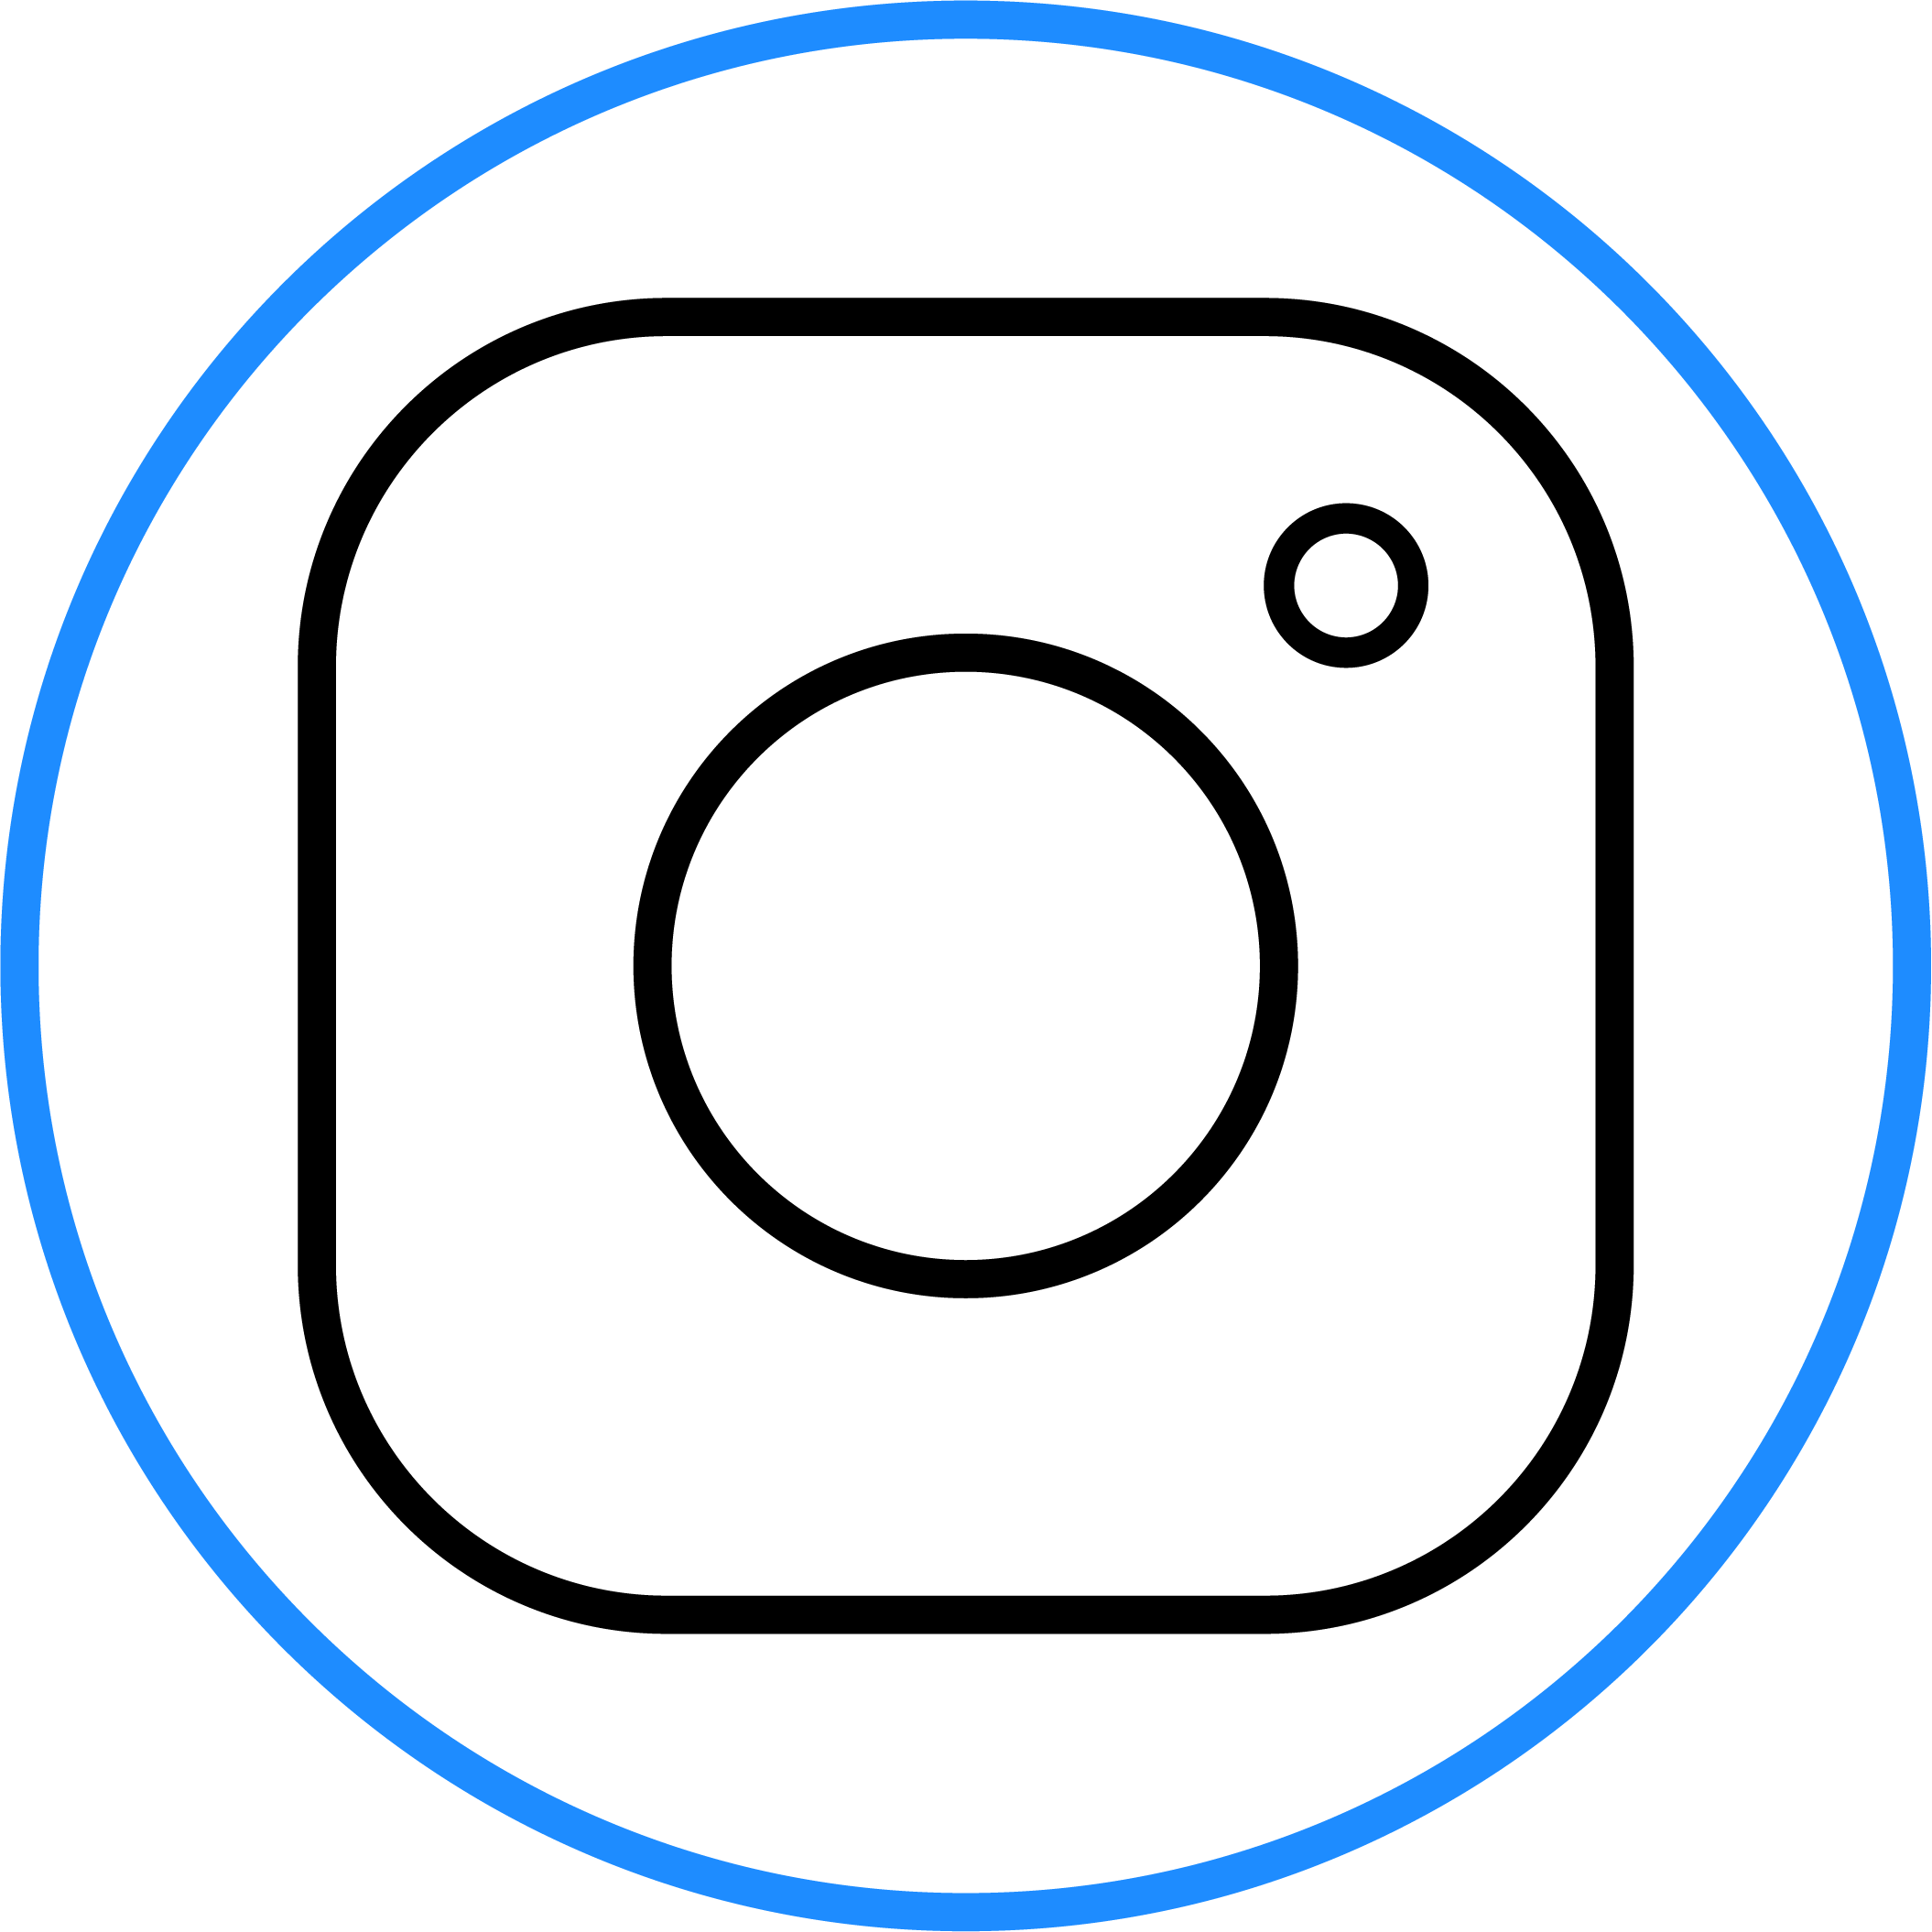 Kontakt Icon: @Instagram